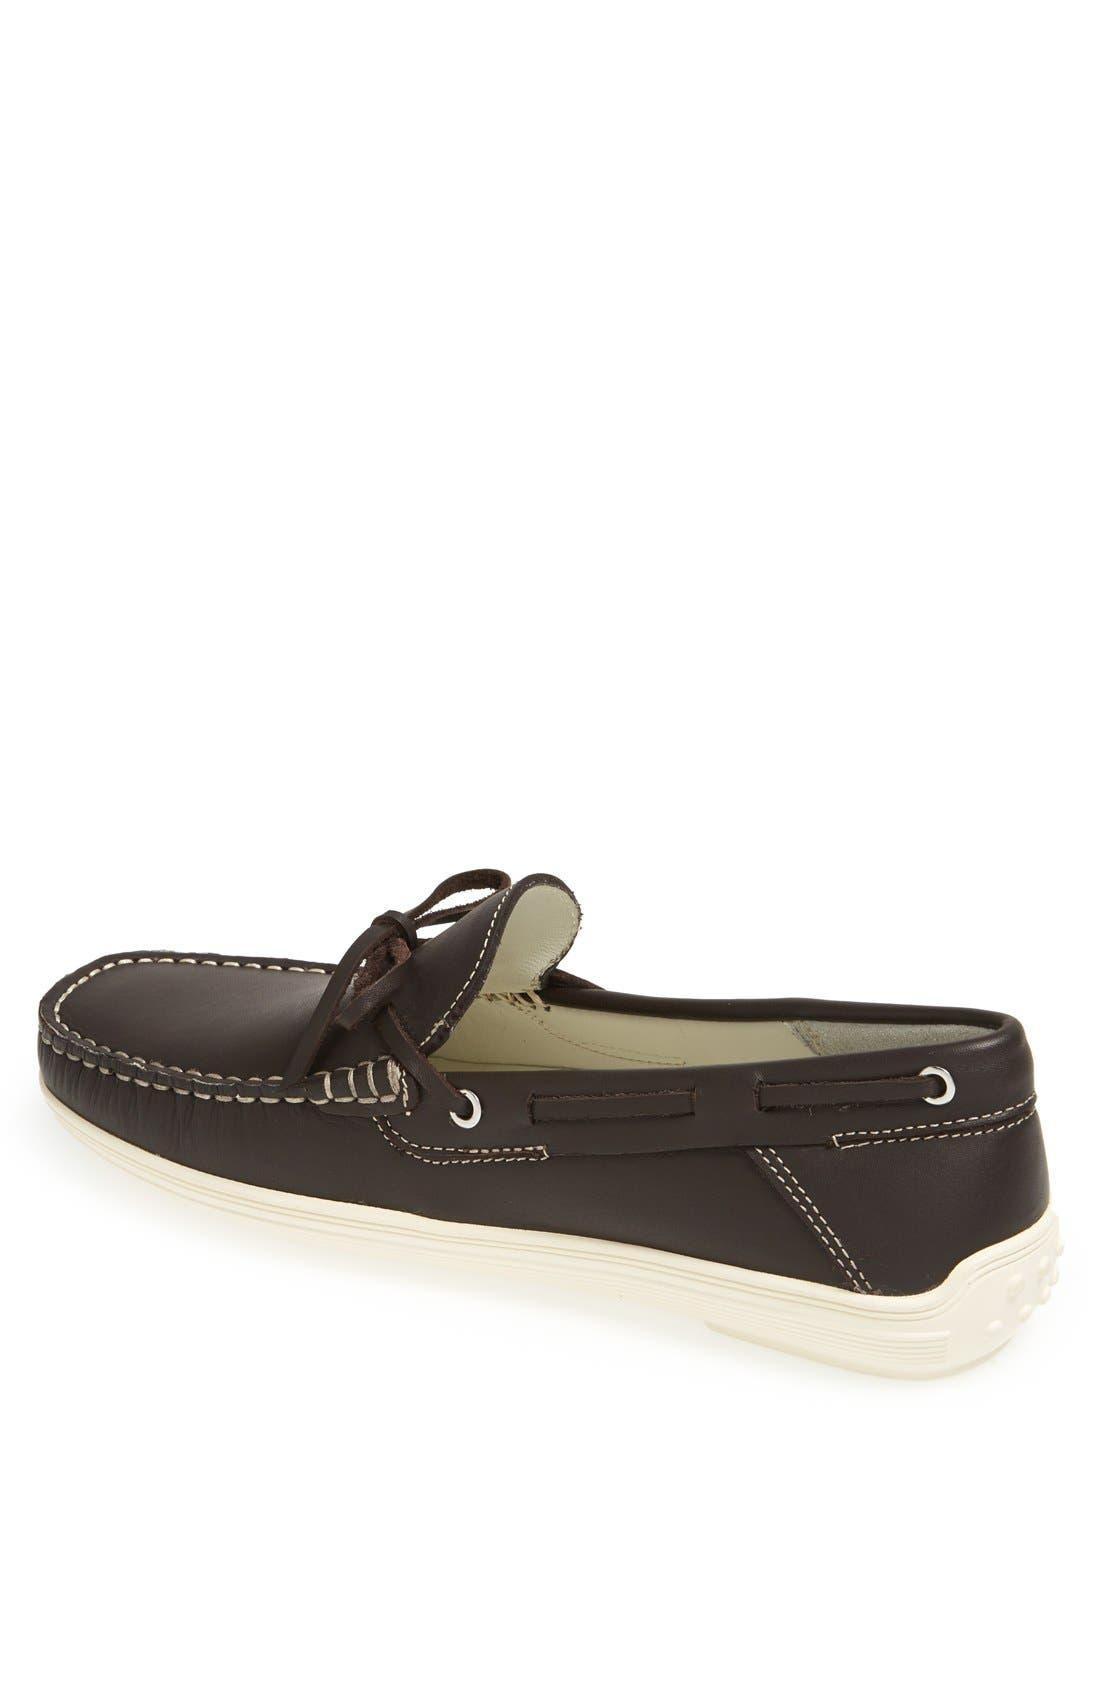 'Bonaire' Driving Shoe,                             Alternate thumbnail 2, color,                             Dark Brown